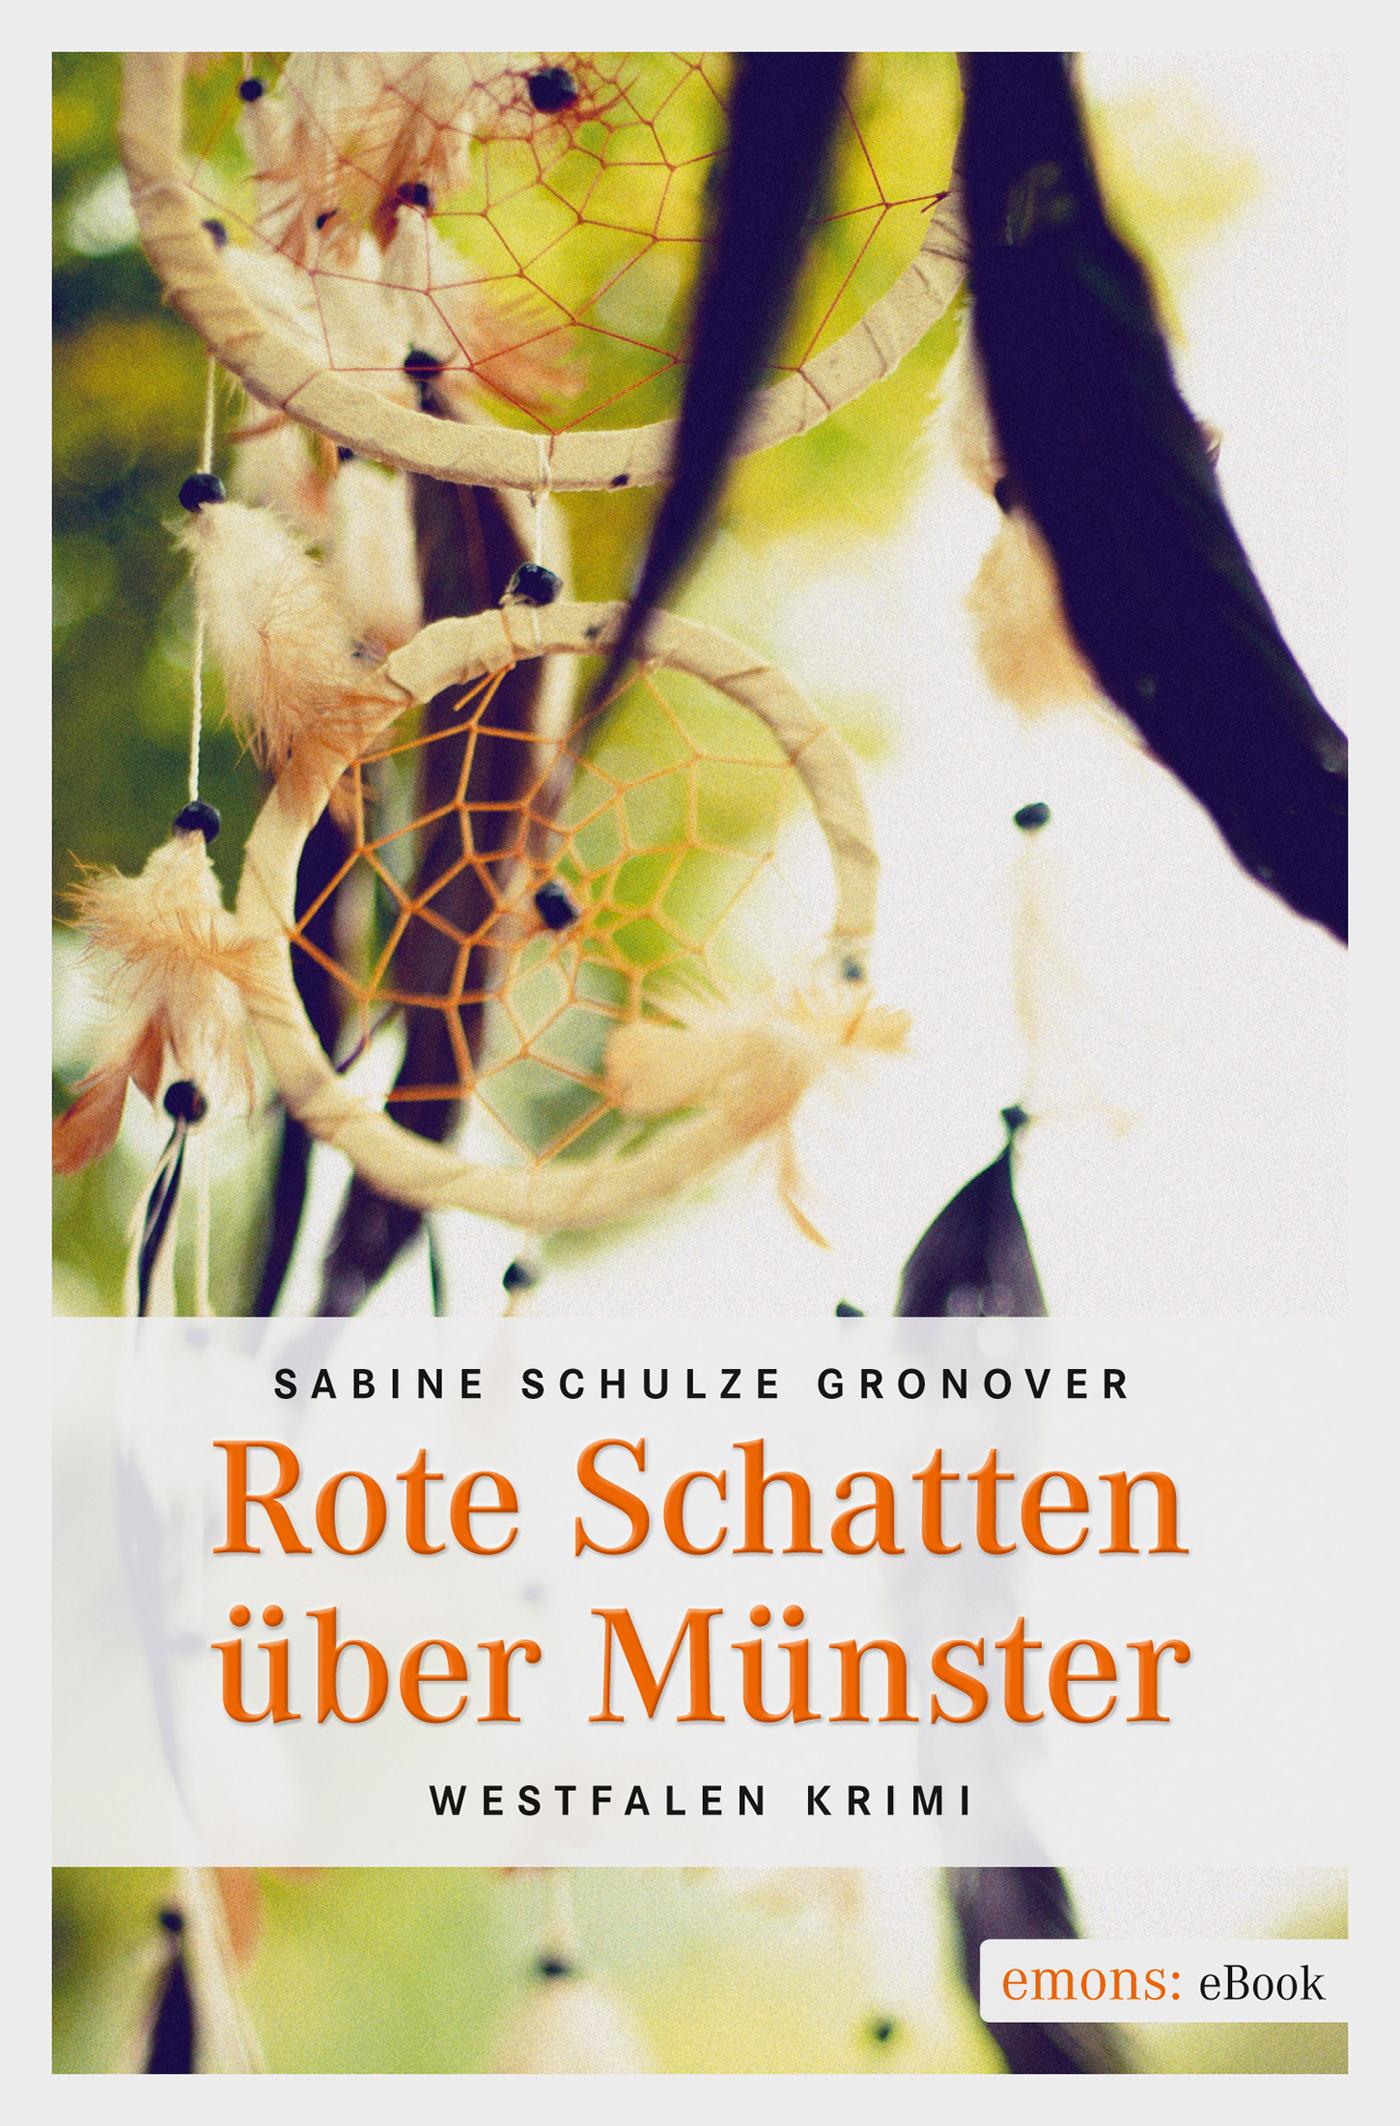 Sabine Schulze Gronover Rote Schatten über Münster capital bra münster